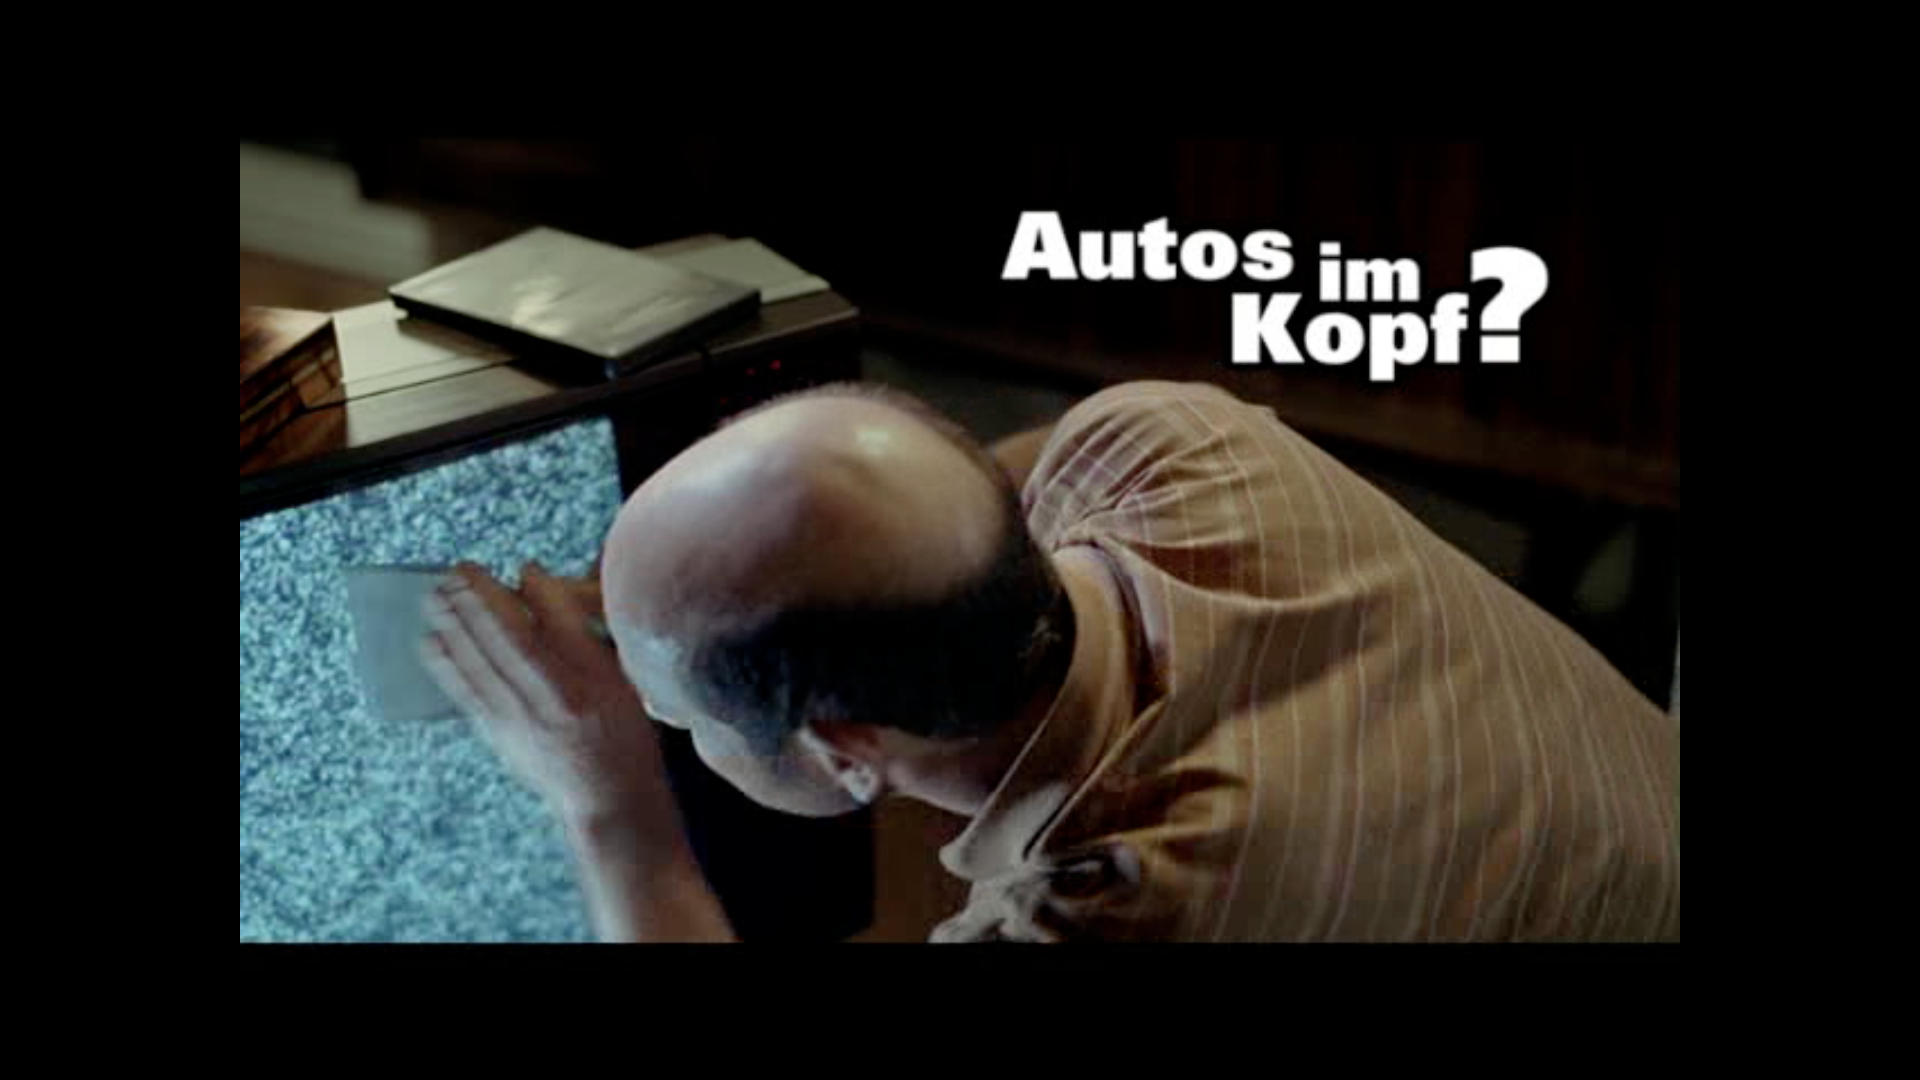 film 2 screenshot 3